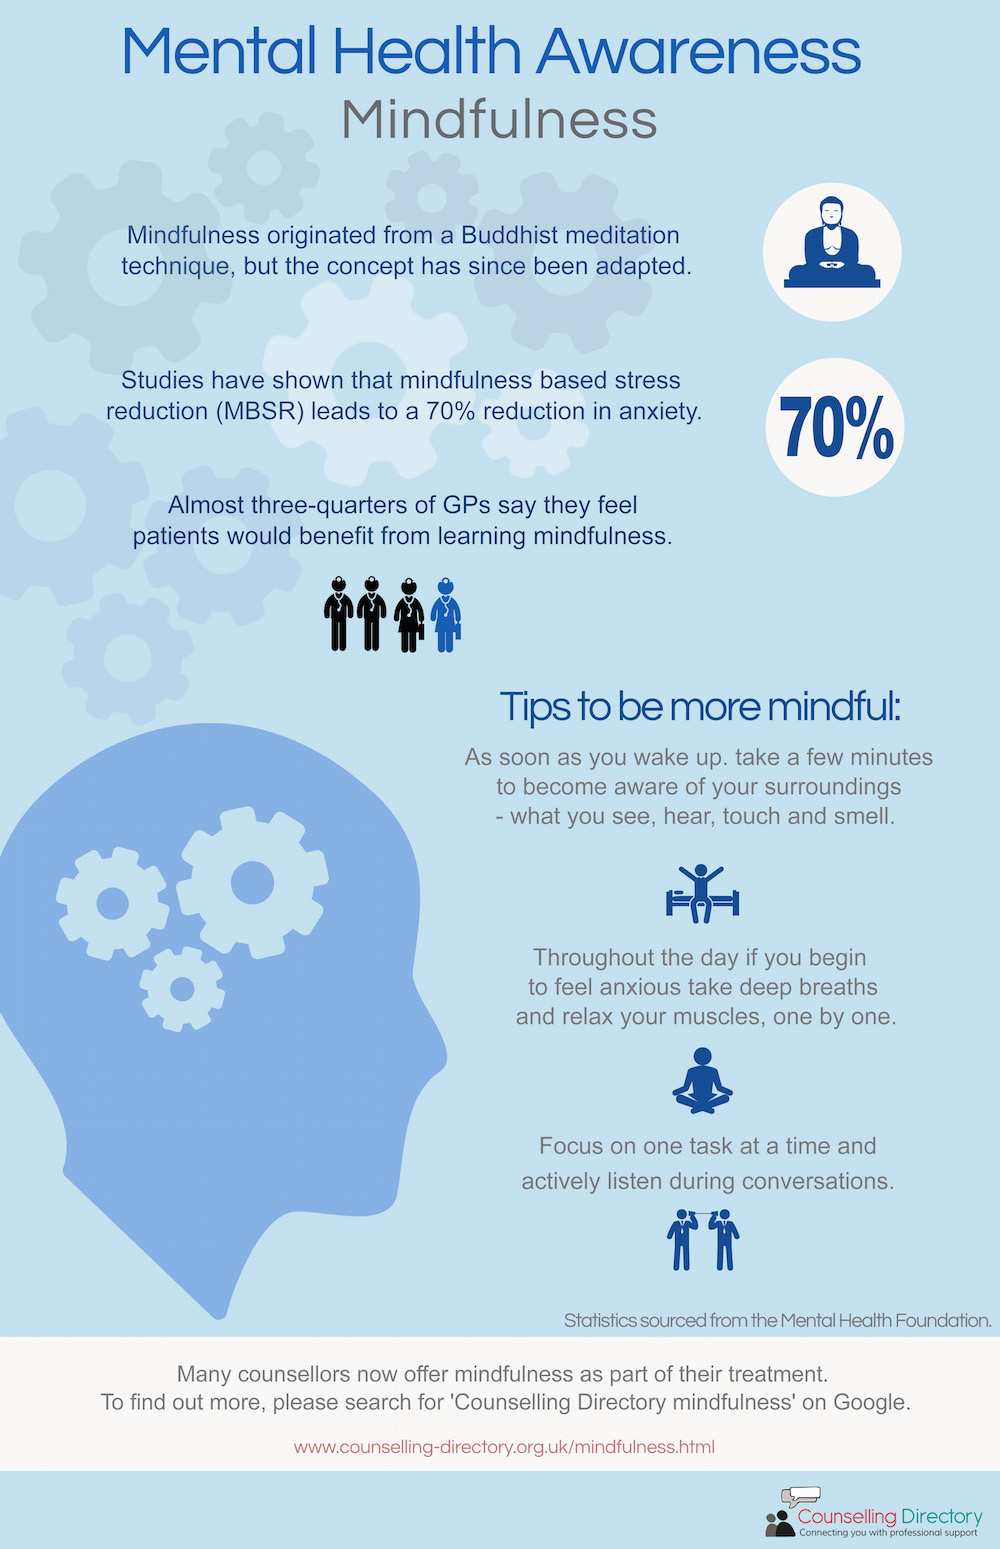 Mental Health Awareness - Mindfulness